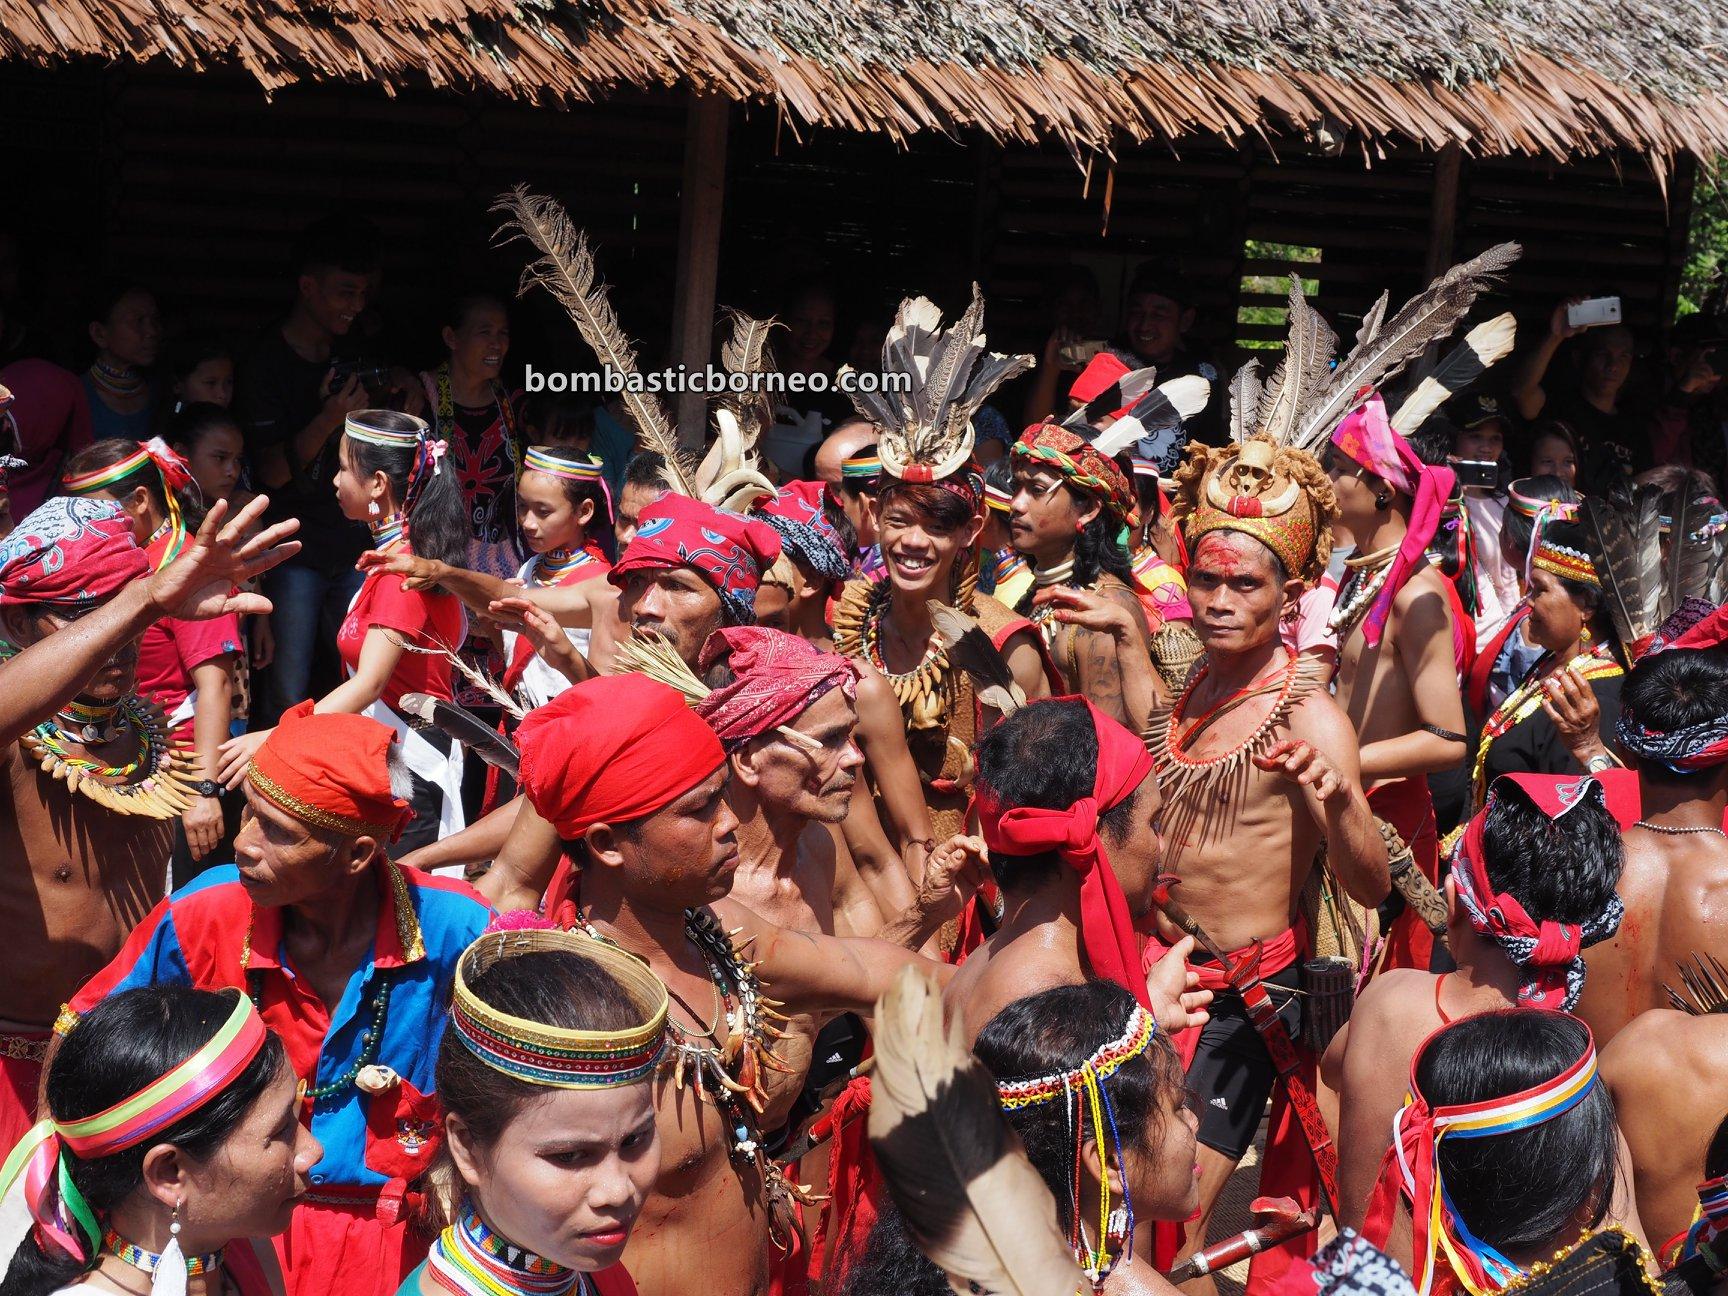 Gawai Serumpun, harvest festival, Sungkung Medeng, authentic, indigenous, culture, Bengkayang, Indonesia, West Kalimantan, Dayak Bidayuh, native, tribal, tourist attraction, travel guide, Trans Border, Borneo